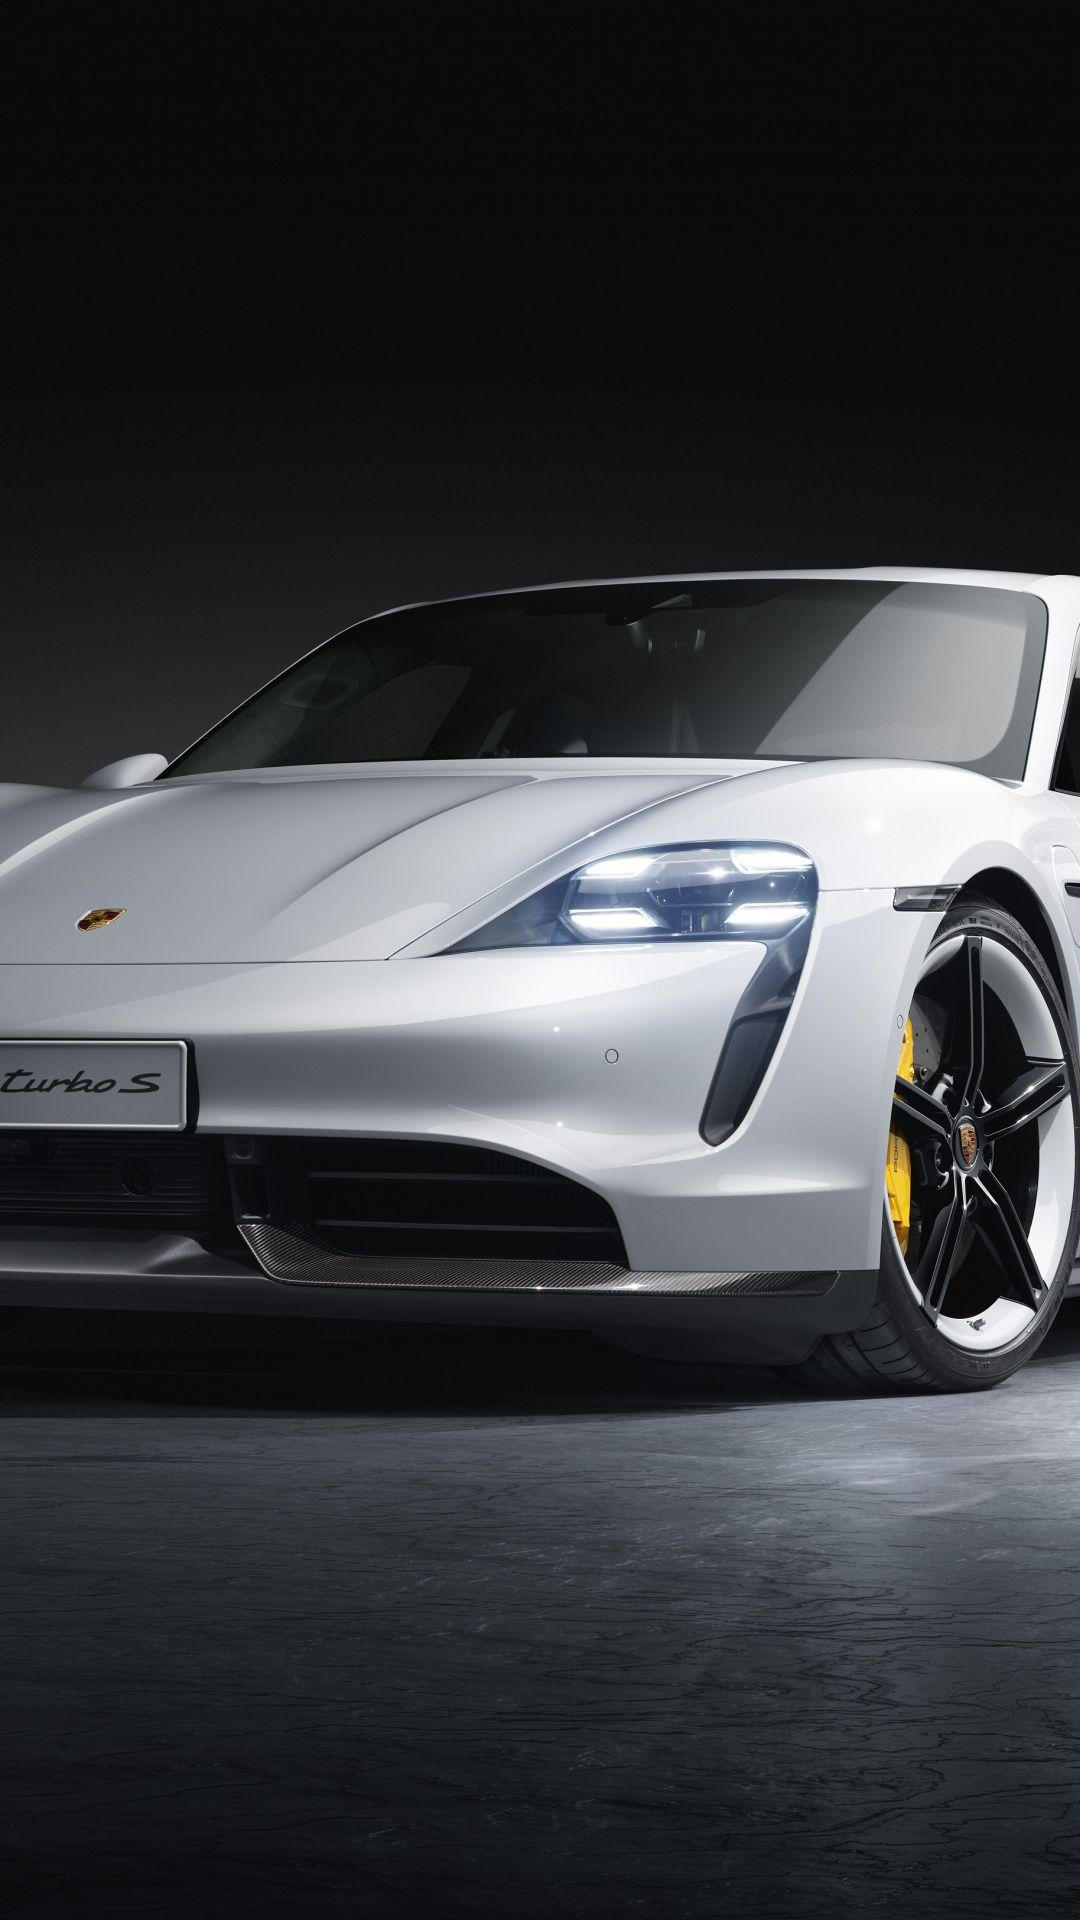 1080x1920 Porsche Taycan Turbo, 2019 wallpaper Porsche